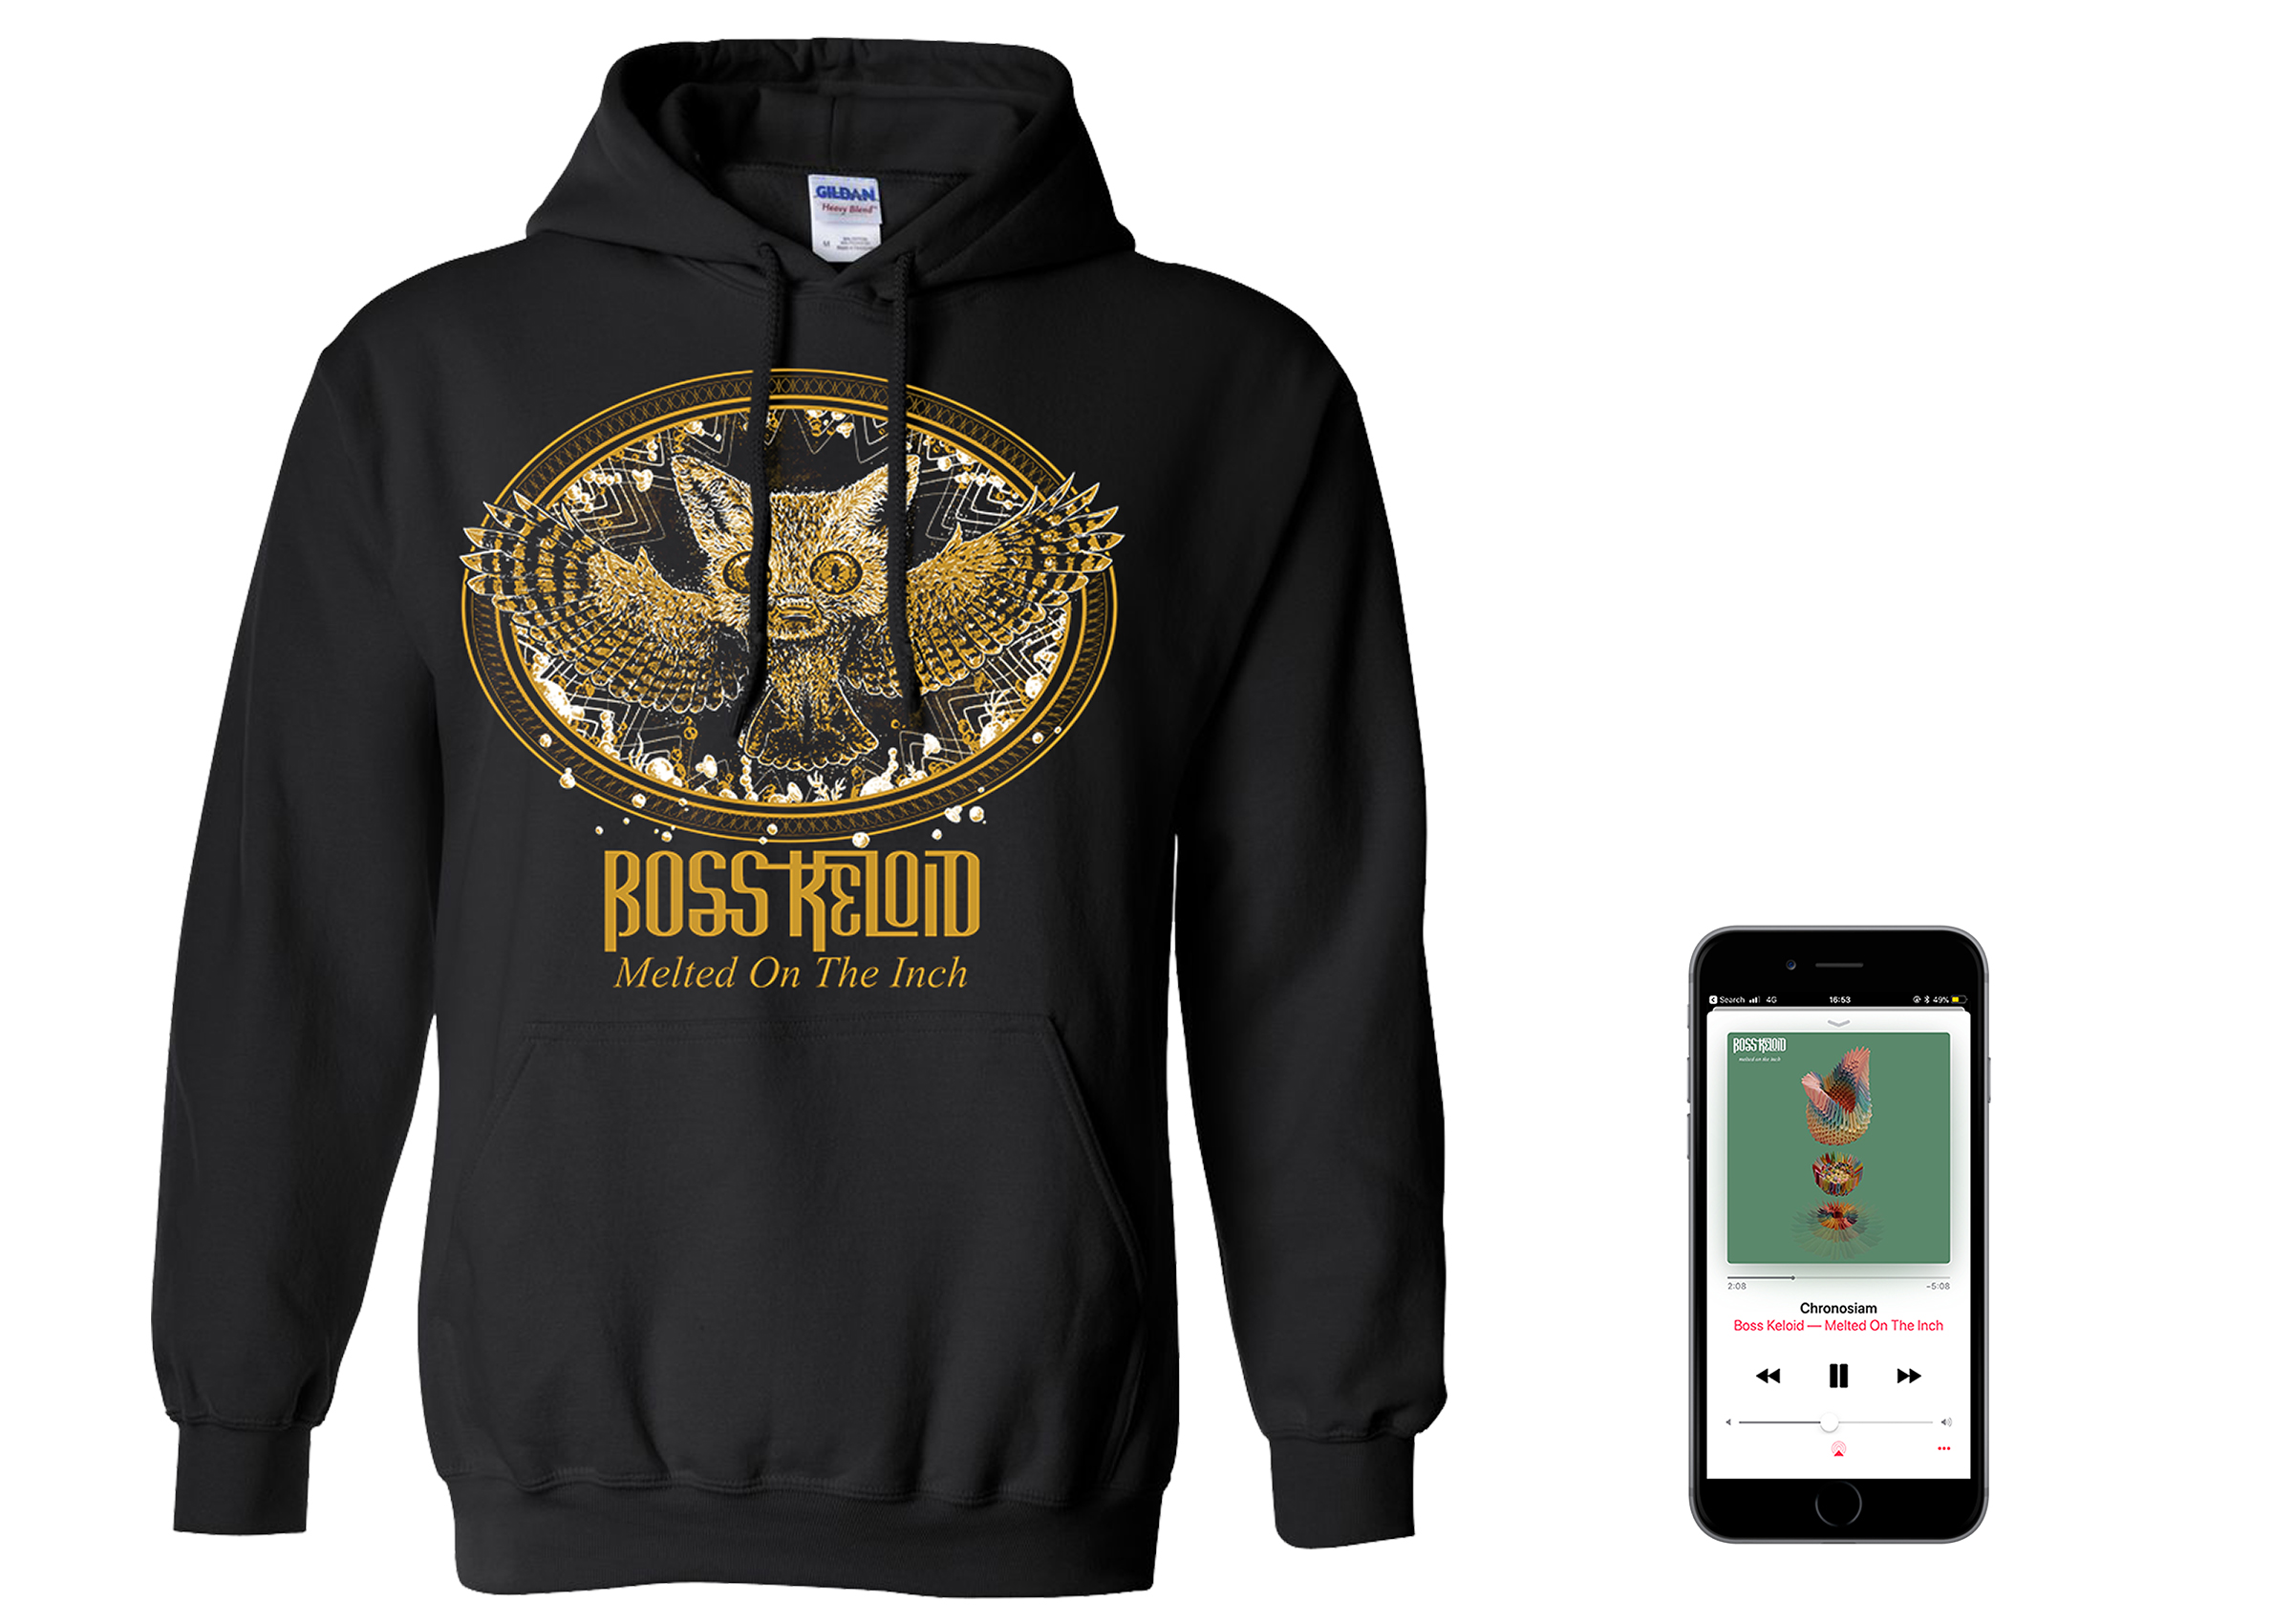 Boss Keloid 'Melted...' Foxowl hoodie + digital download